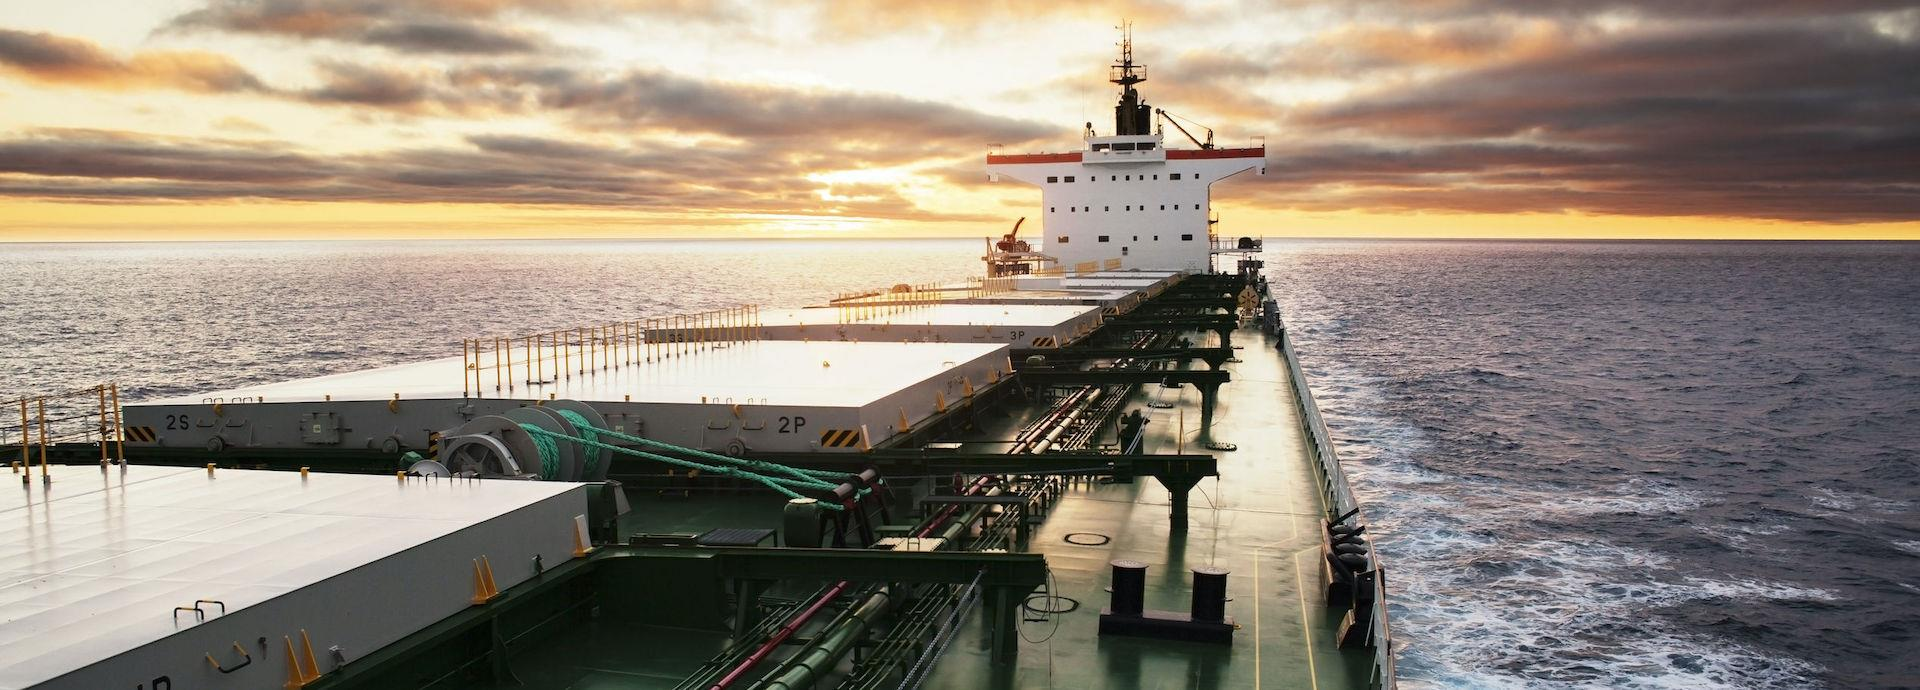 Cargo ship at sea, view from bridge